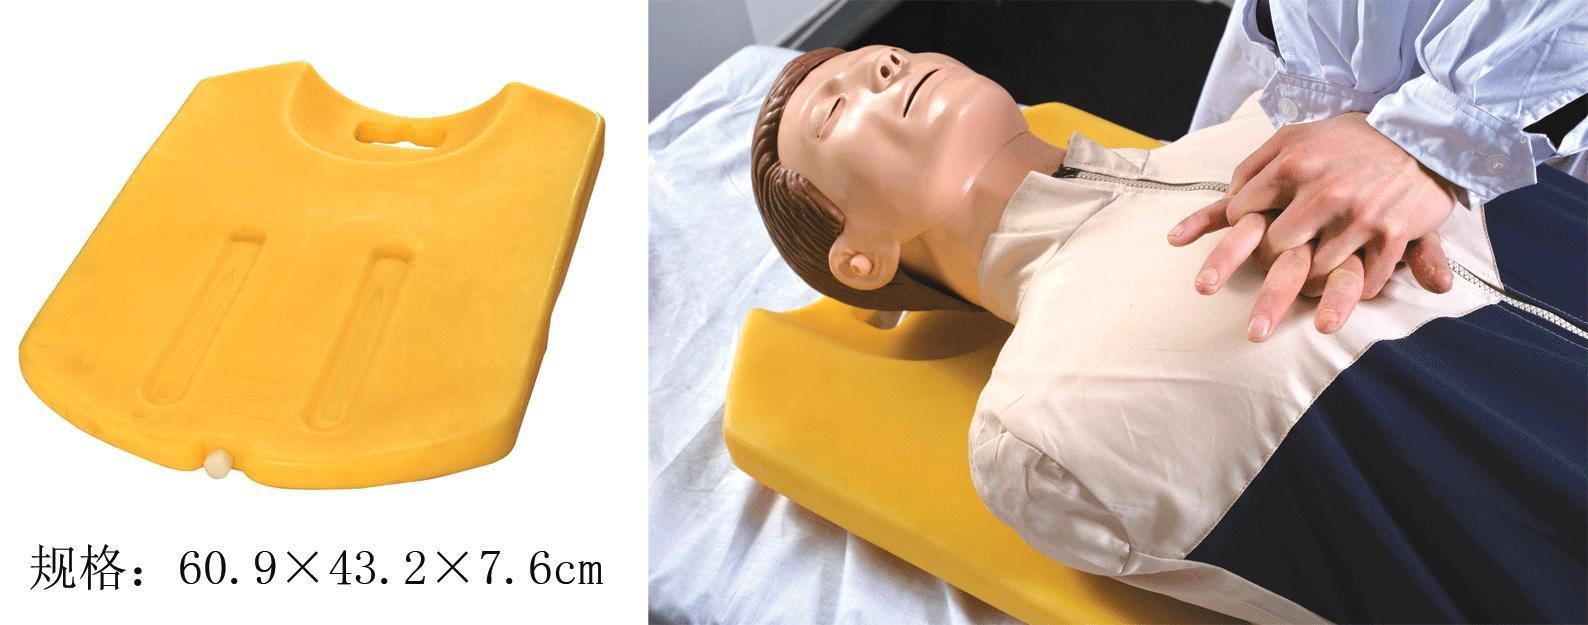 CPR按压板对训练和进行心肺复苏有很大的帮助,能使病人在CPR过程中始终保持气道打开的正确位置